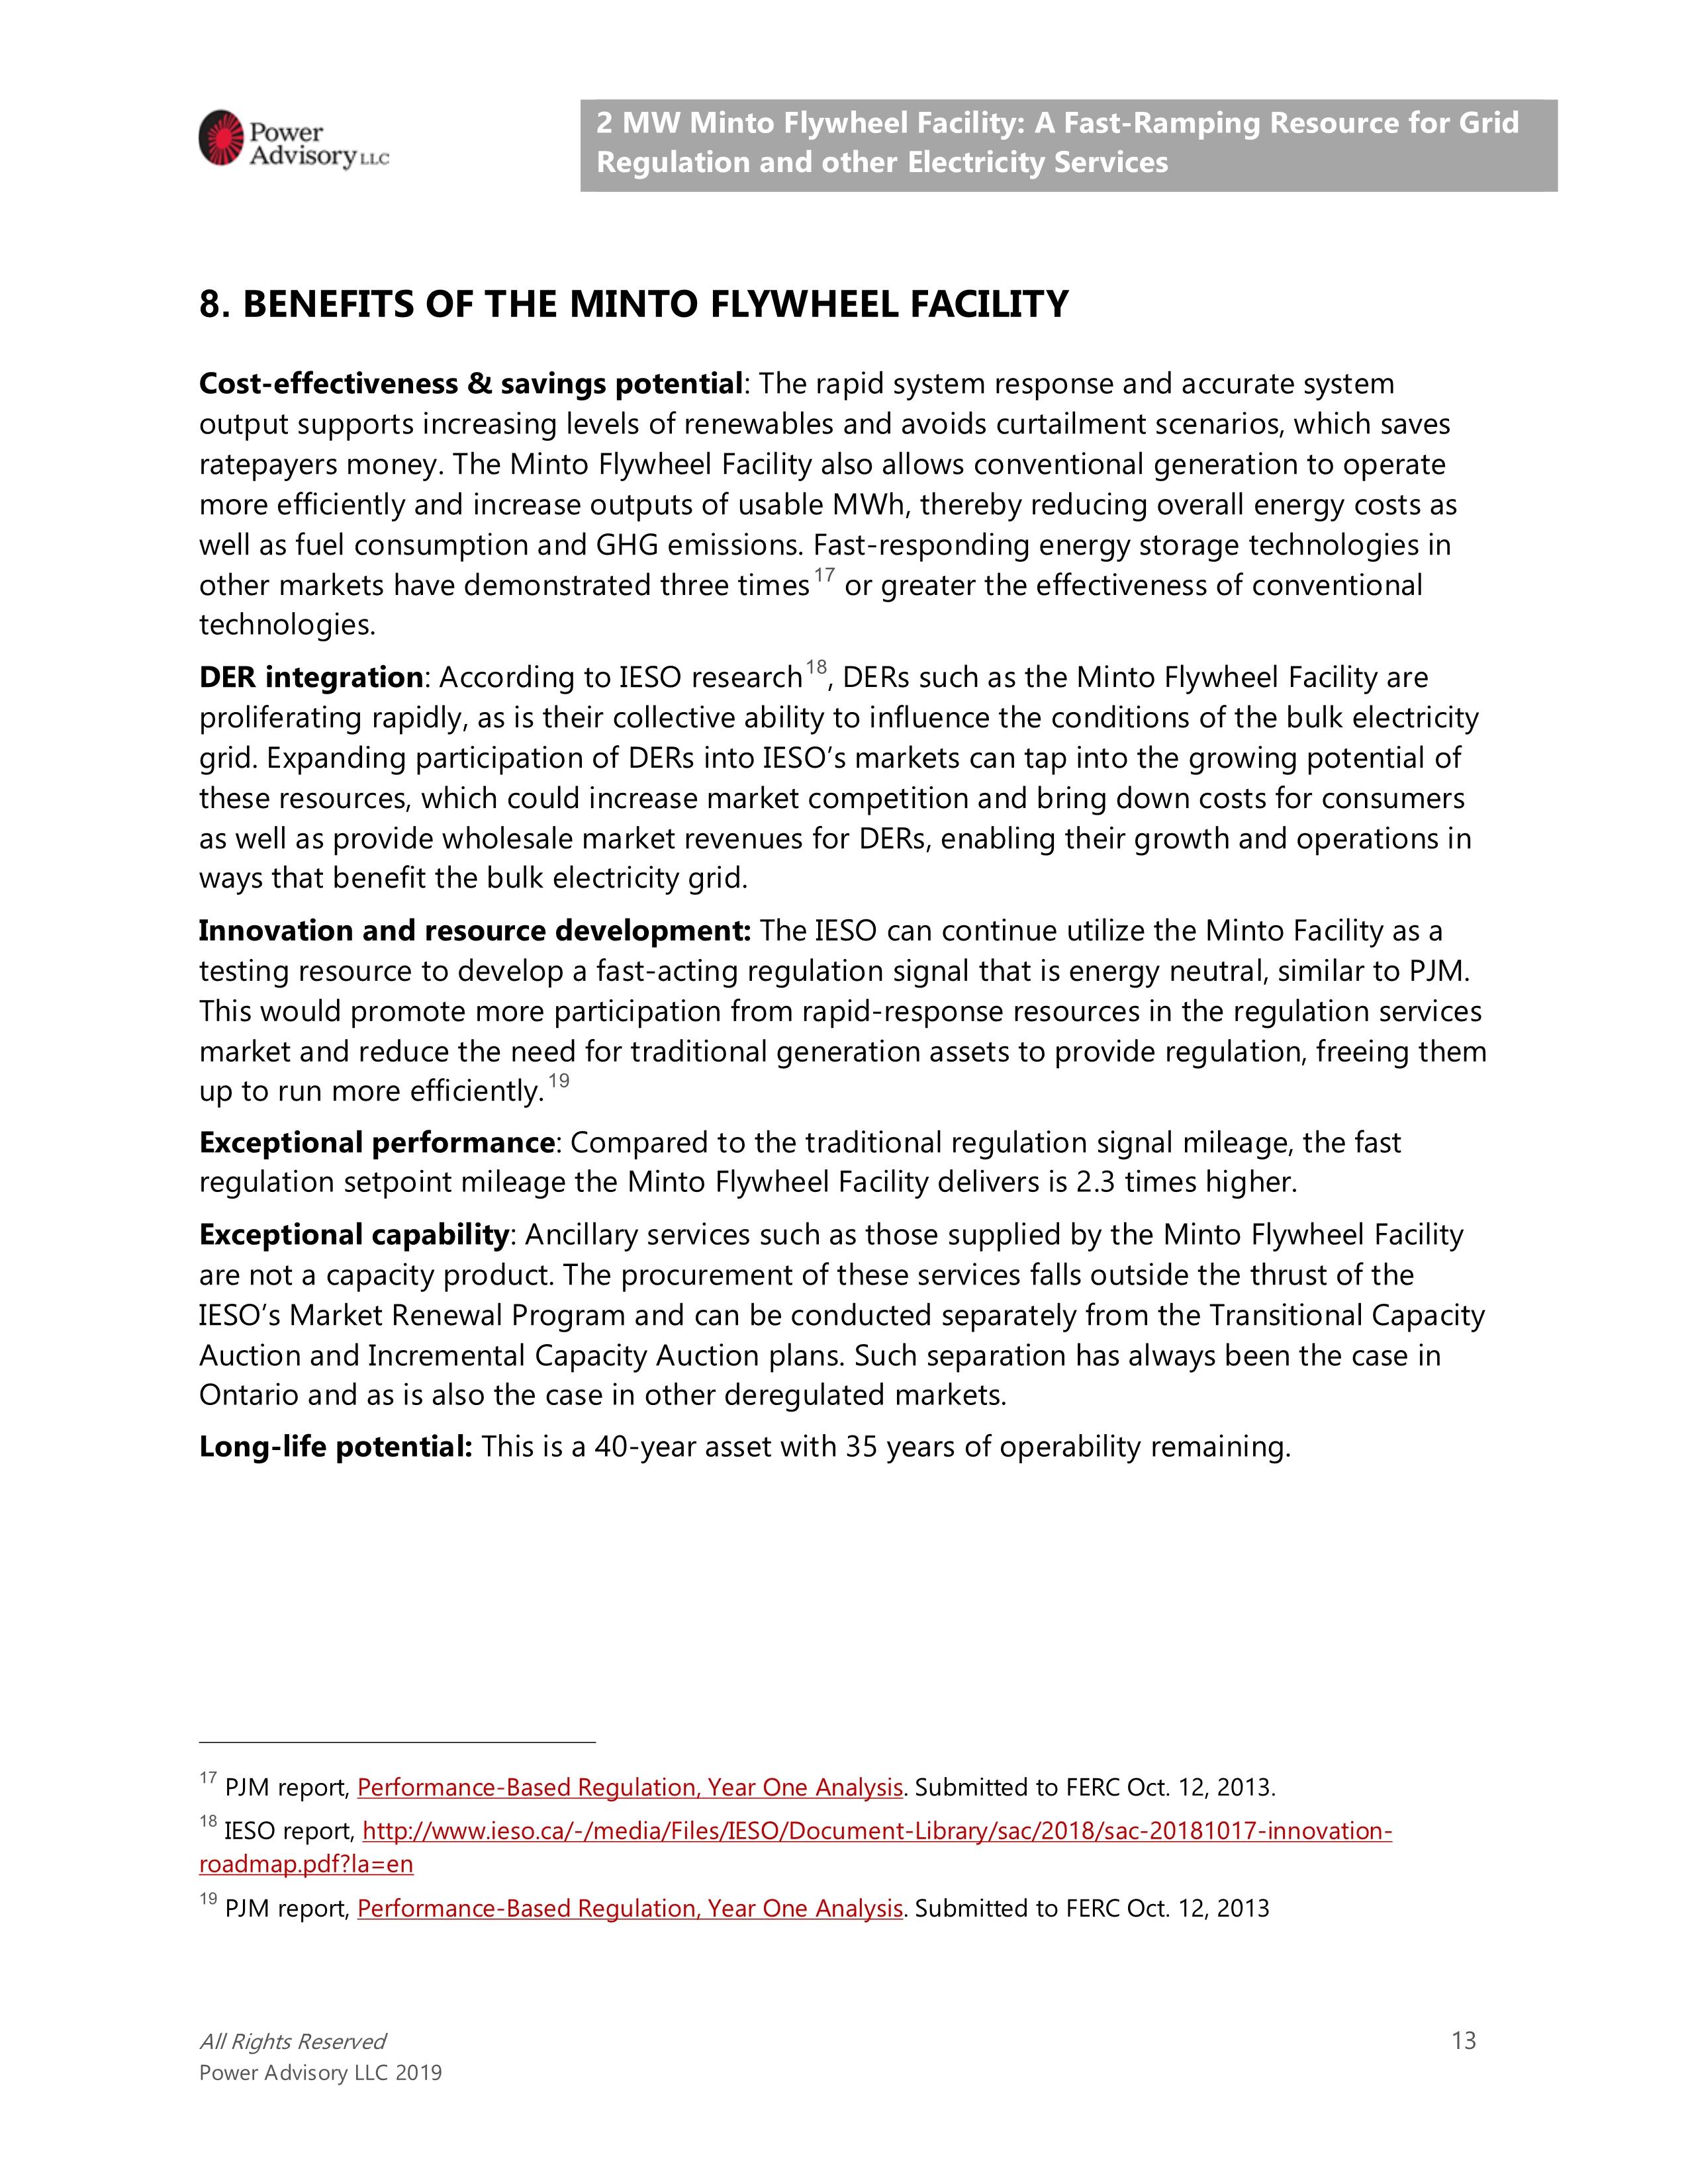 2-MW-Minto-Flywheel-Facility-Case-Study-4_2.jpg